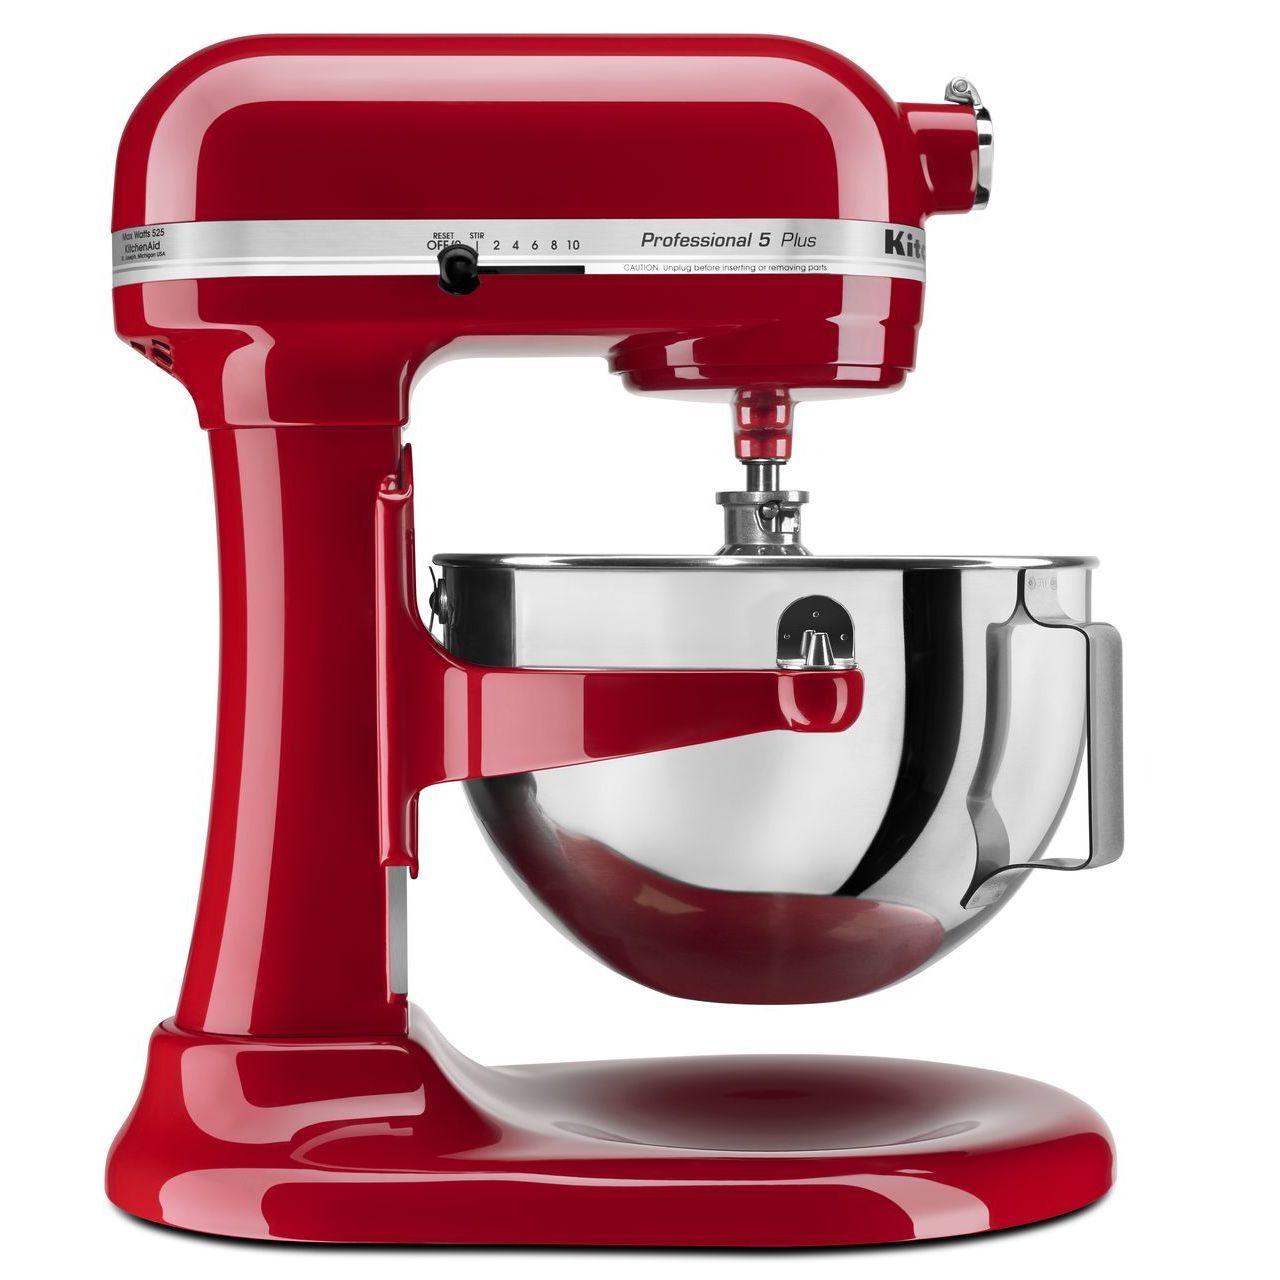 shop kitchenaid rkv25g0x 5 quart pro 5 plus bowl lift stand mixer